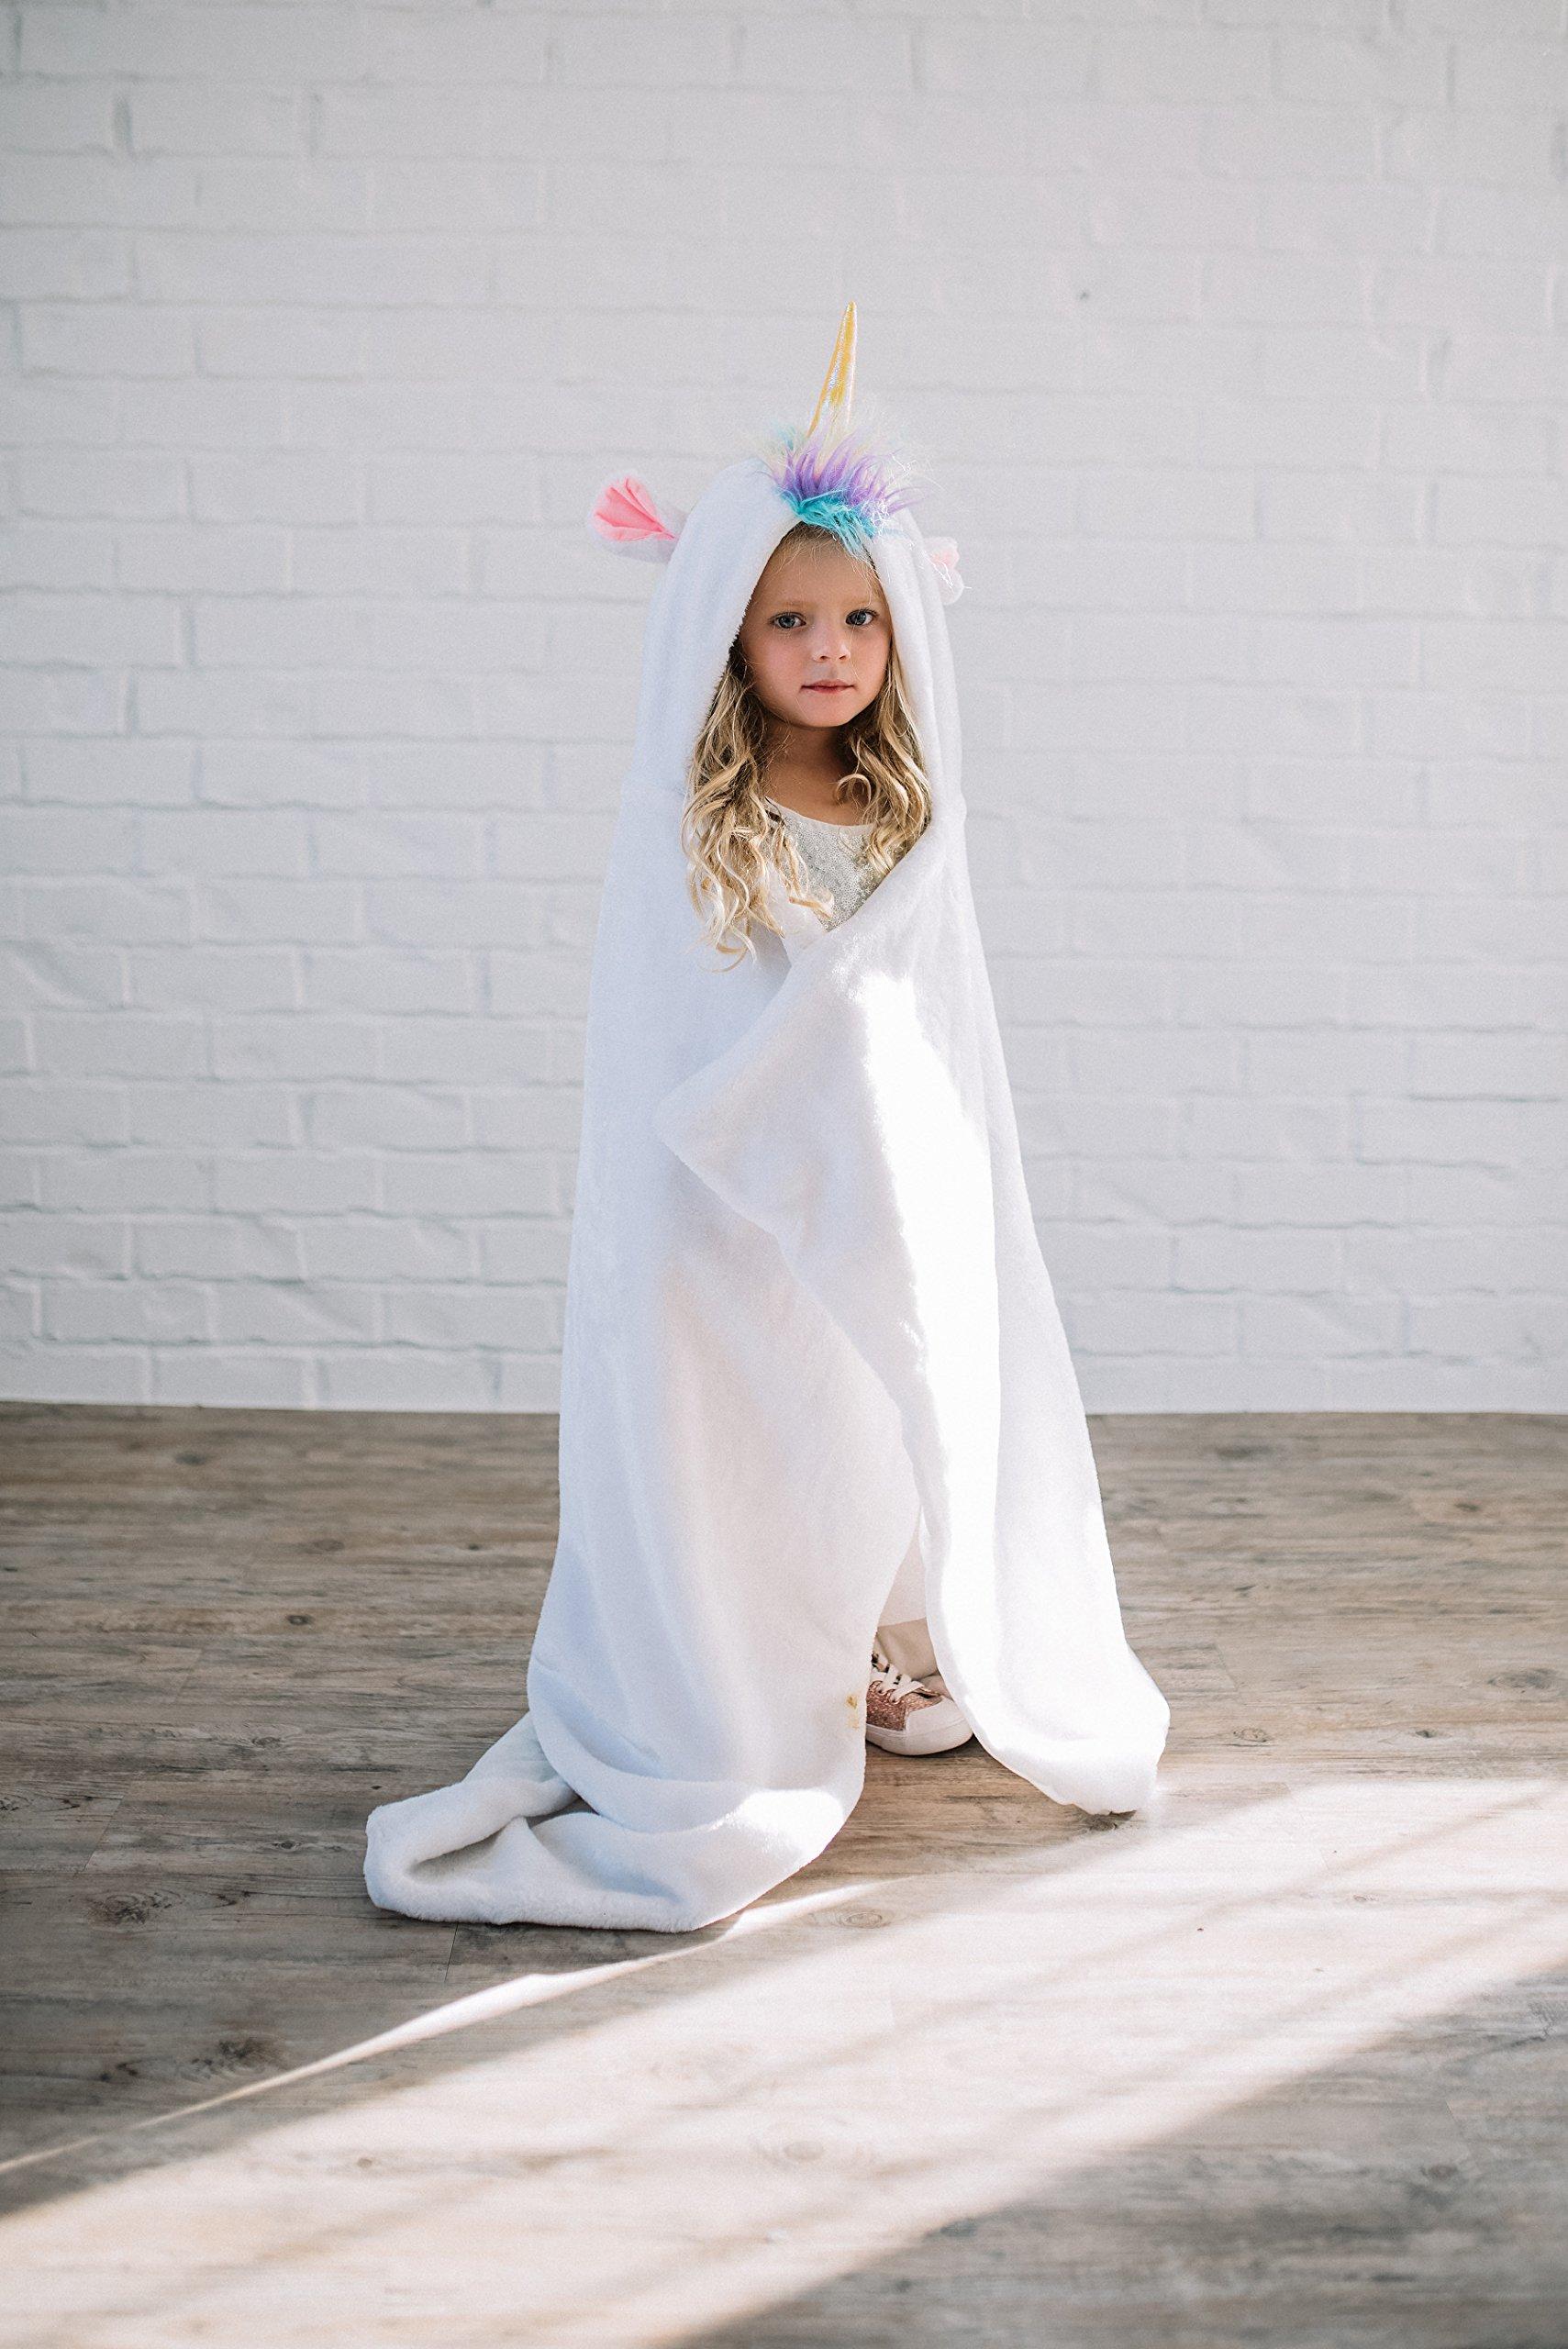 JaceyLane - Unicorn Blanket | Comfortable Soft Mink Fabric Blanket| by JaceyLane (Image #2)